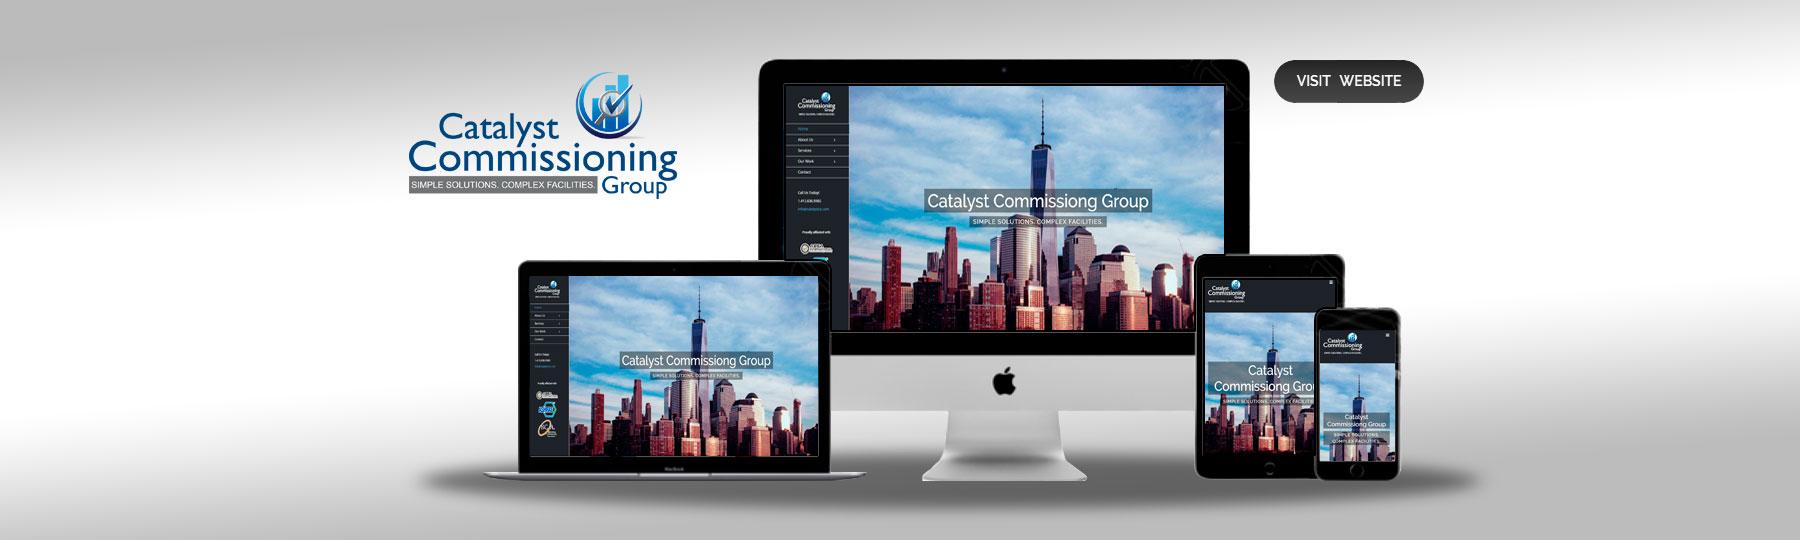 mmpcfl-slider_web_design-slide3-CCG